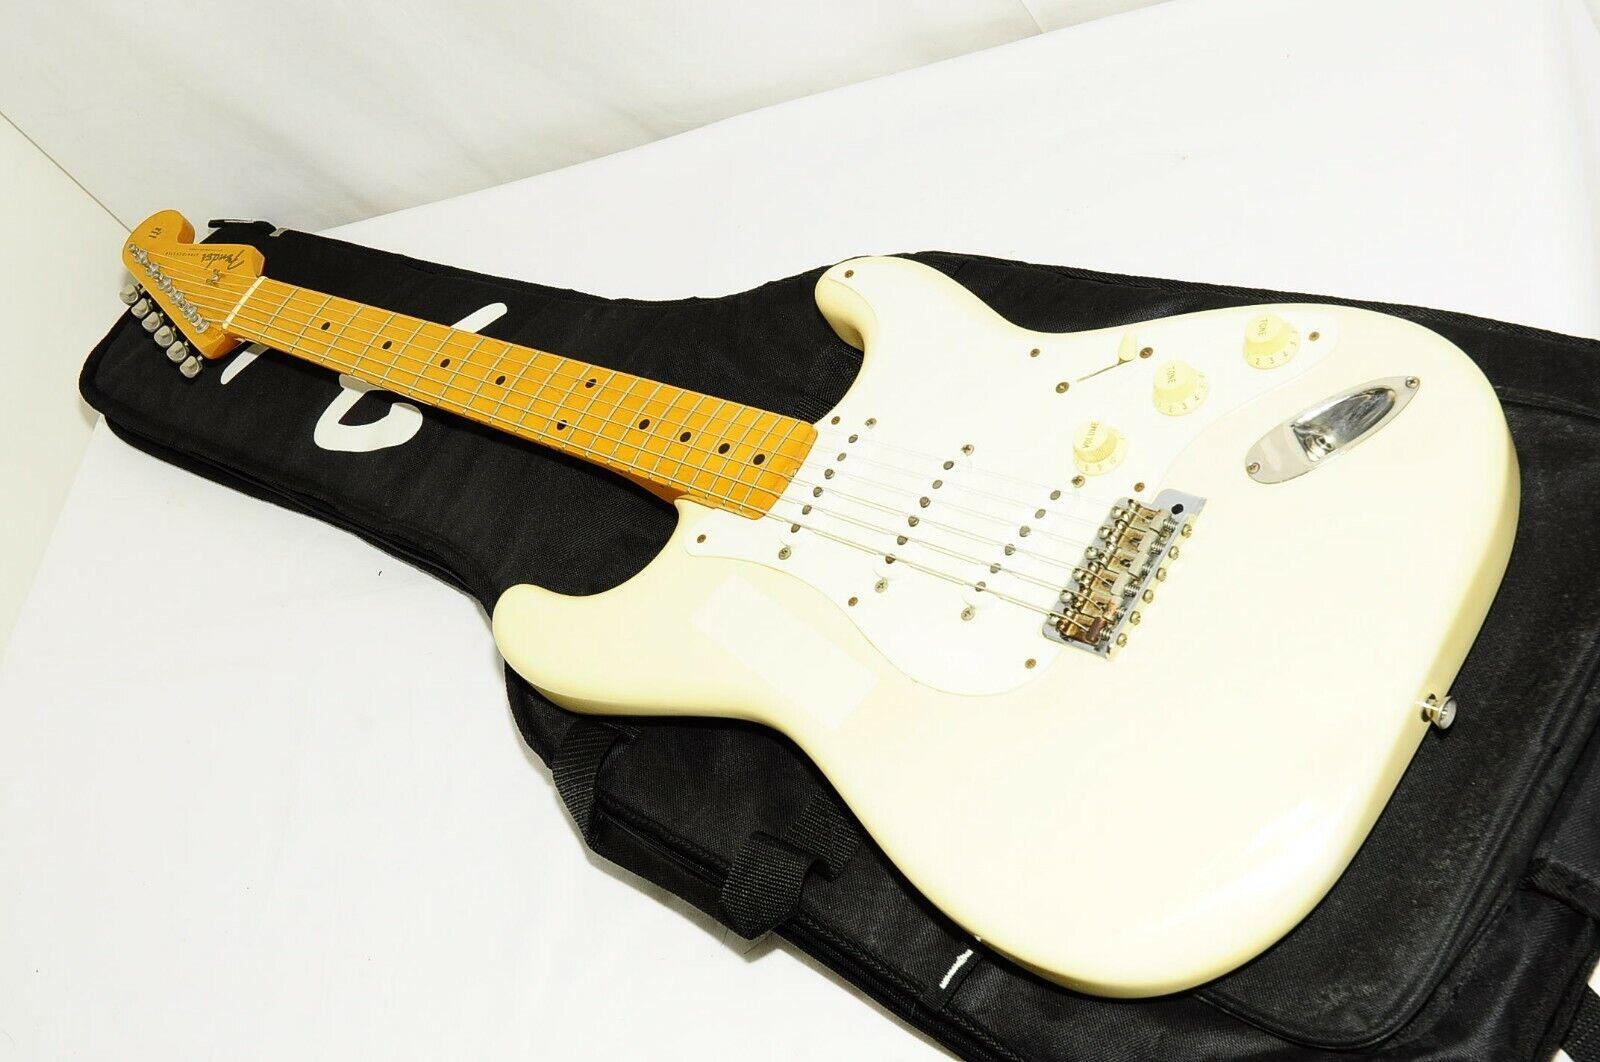 Excellent Fender Japan ST57-70TX '57 Stratocaster Electric Guitar Ref No 2176